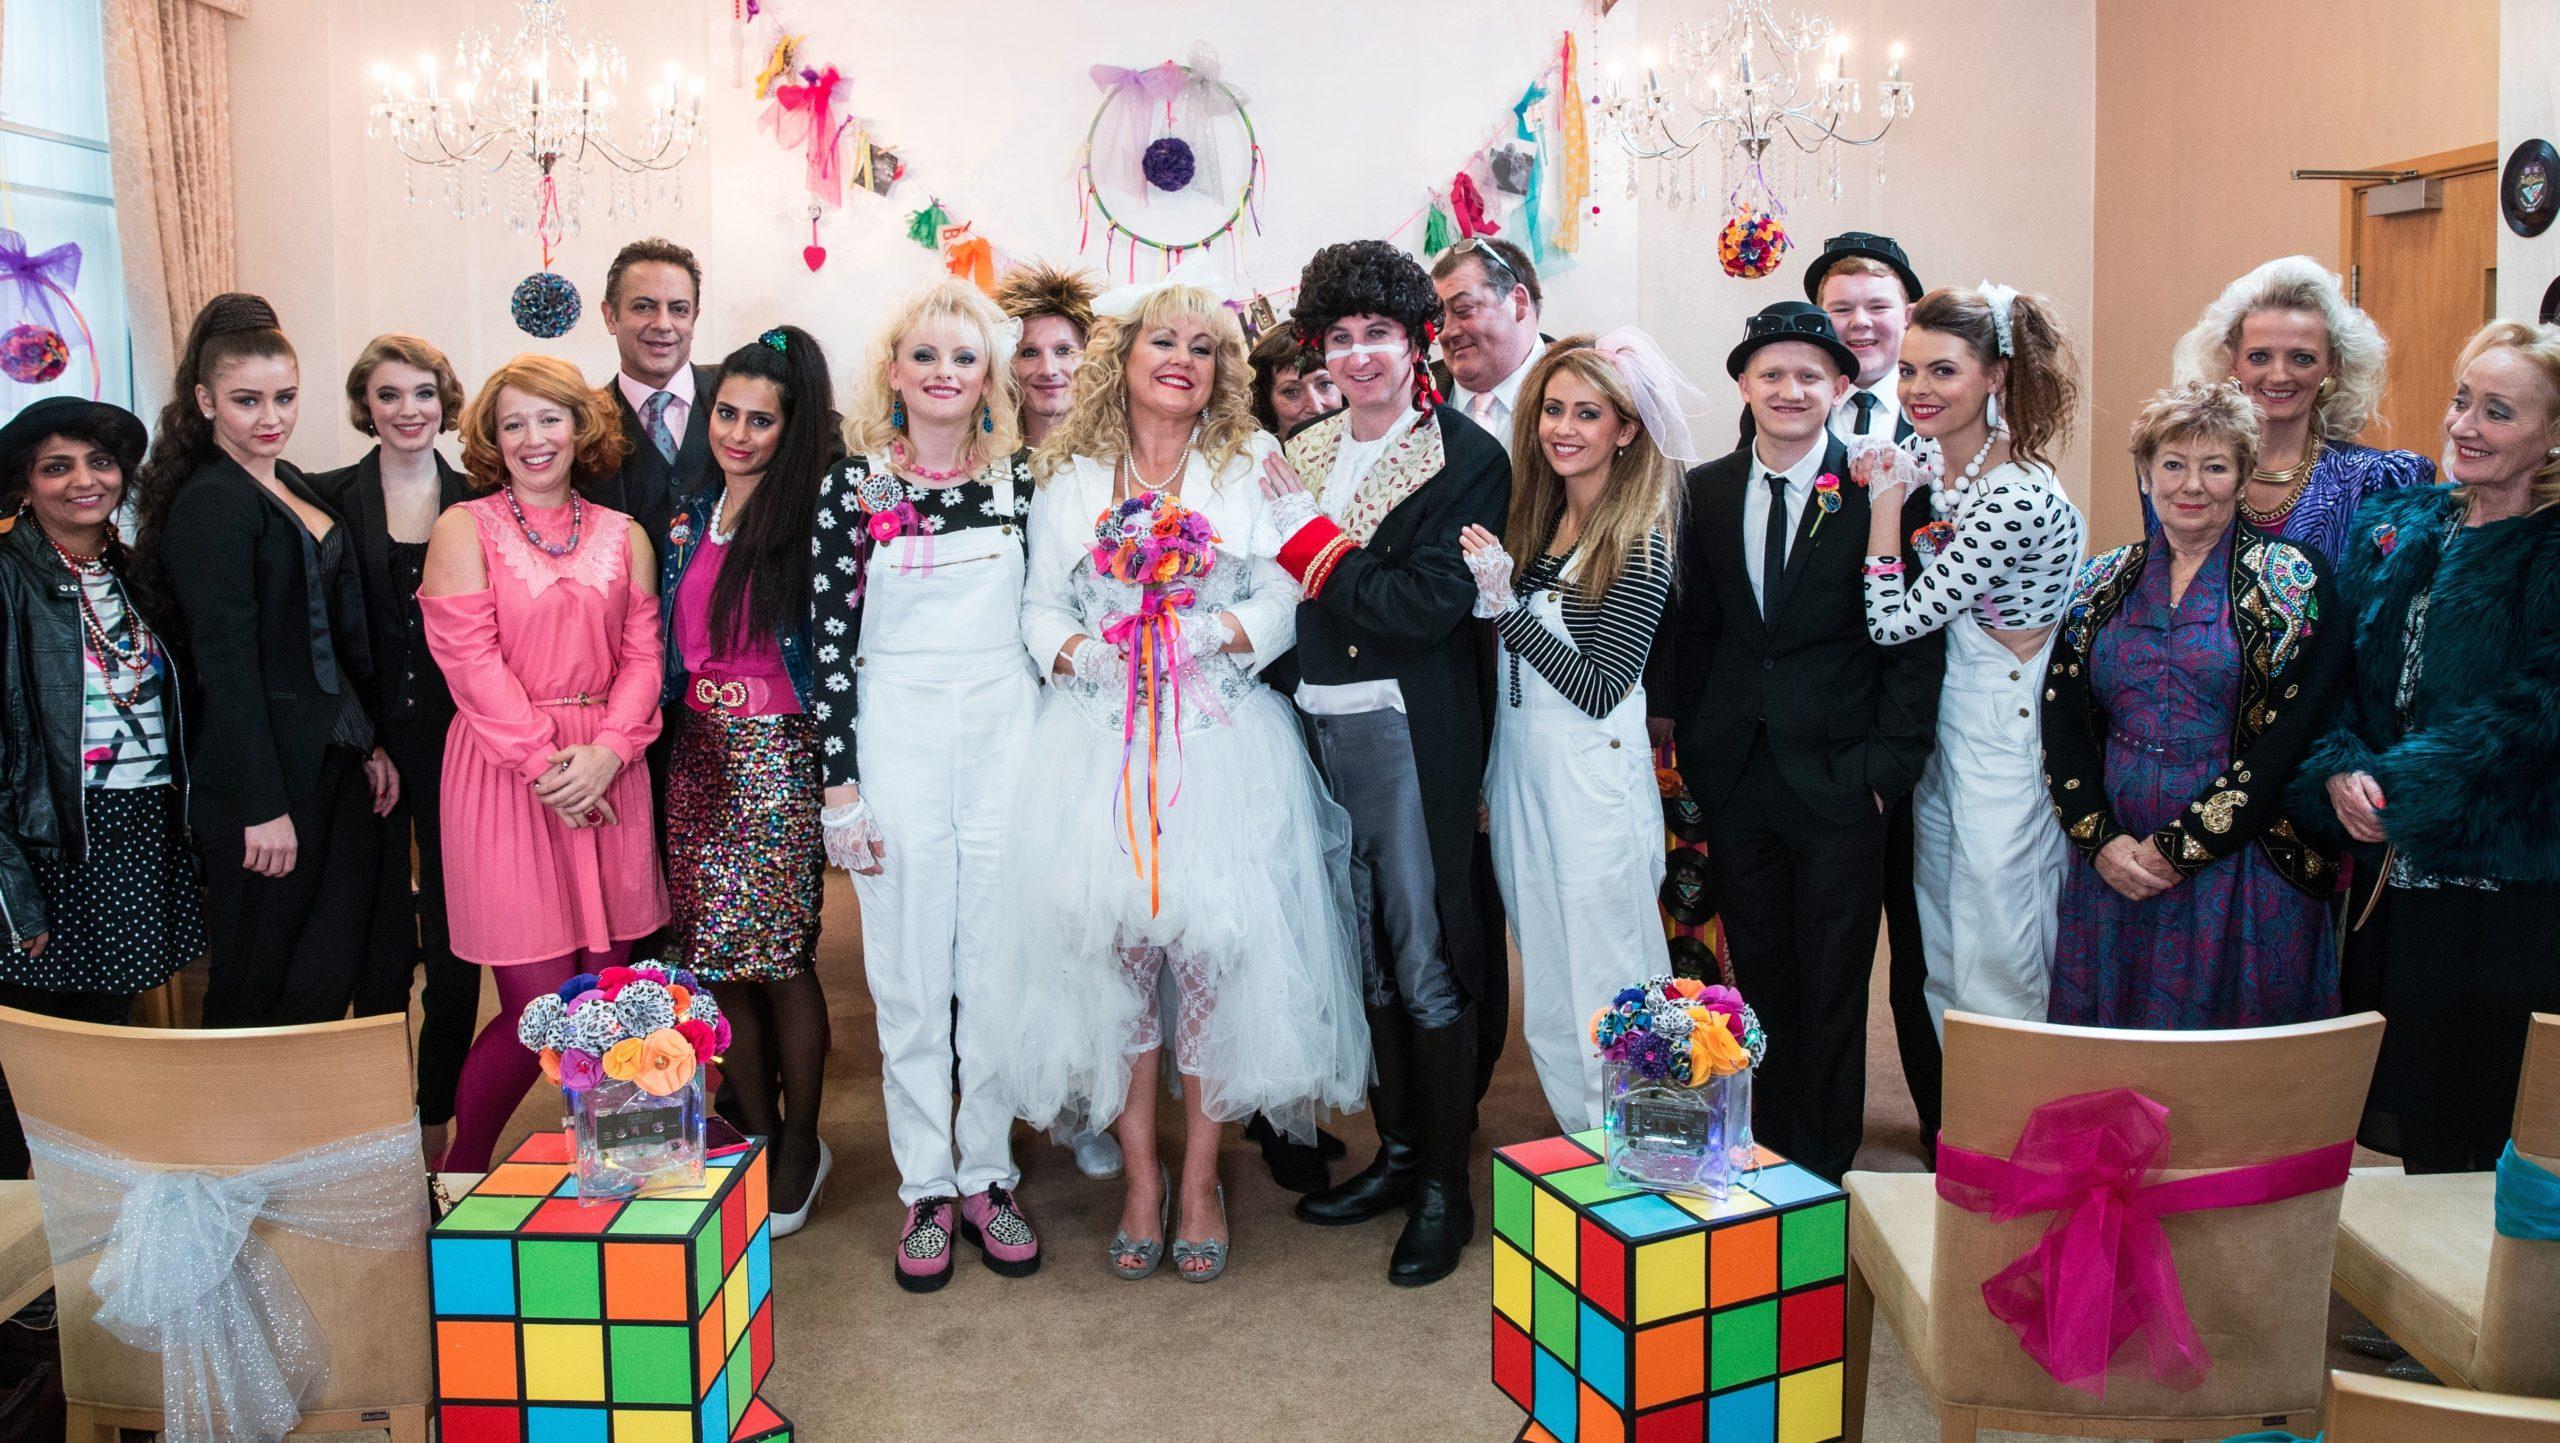 kirk and beth 80s themed wedding coronation street